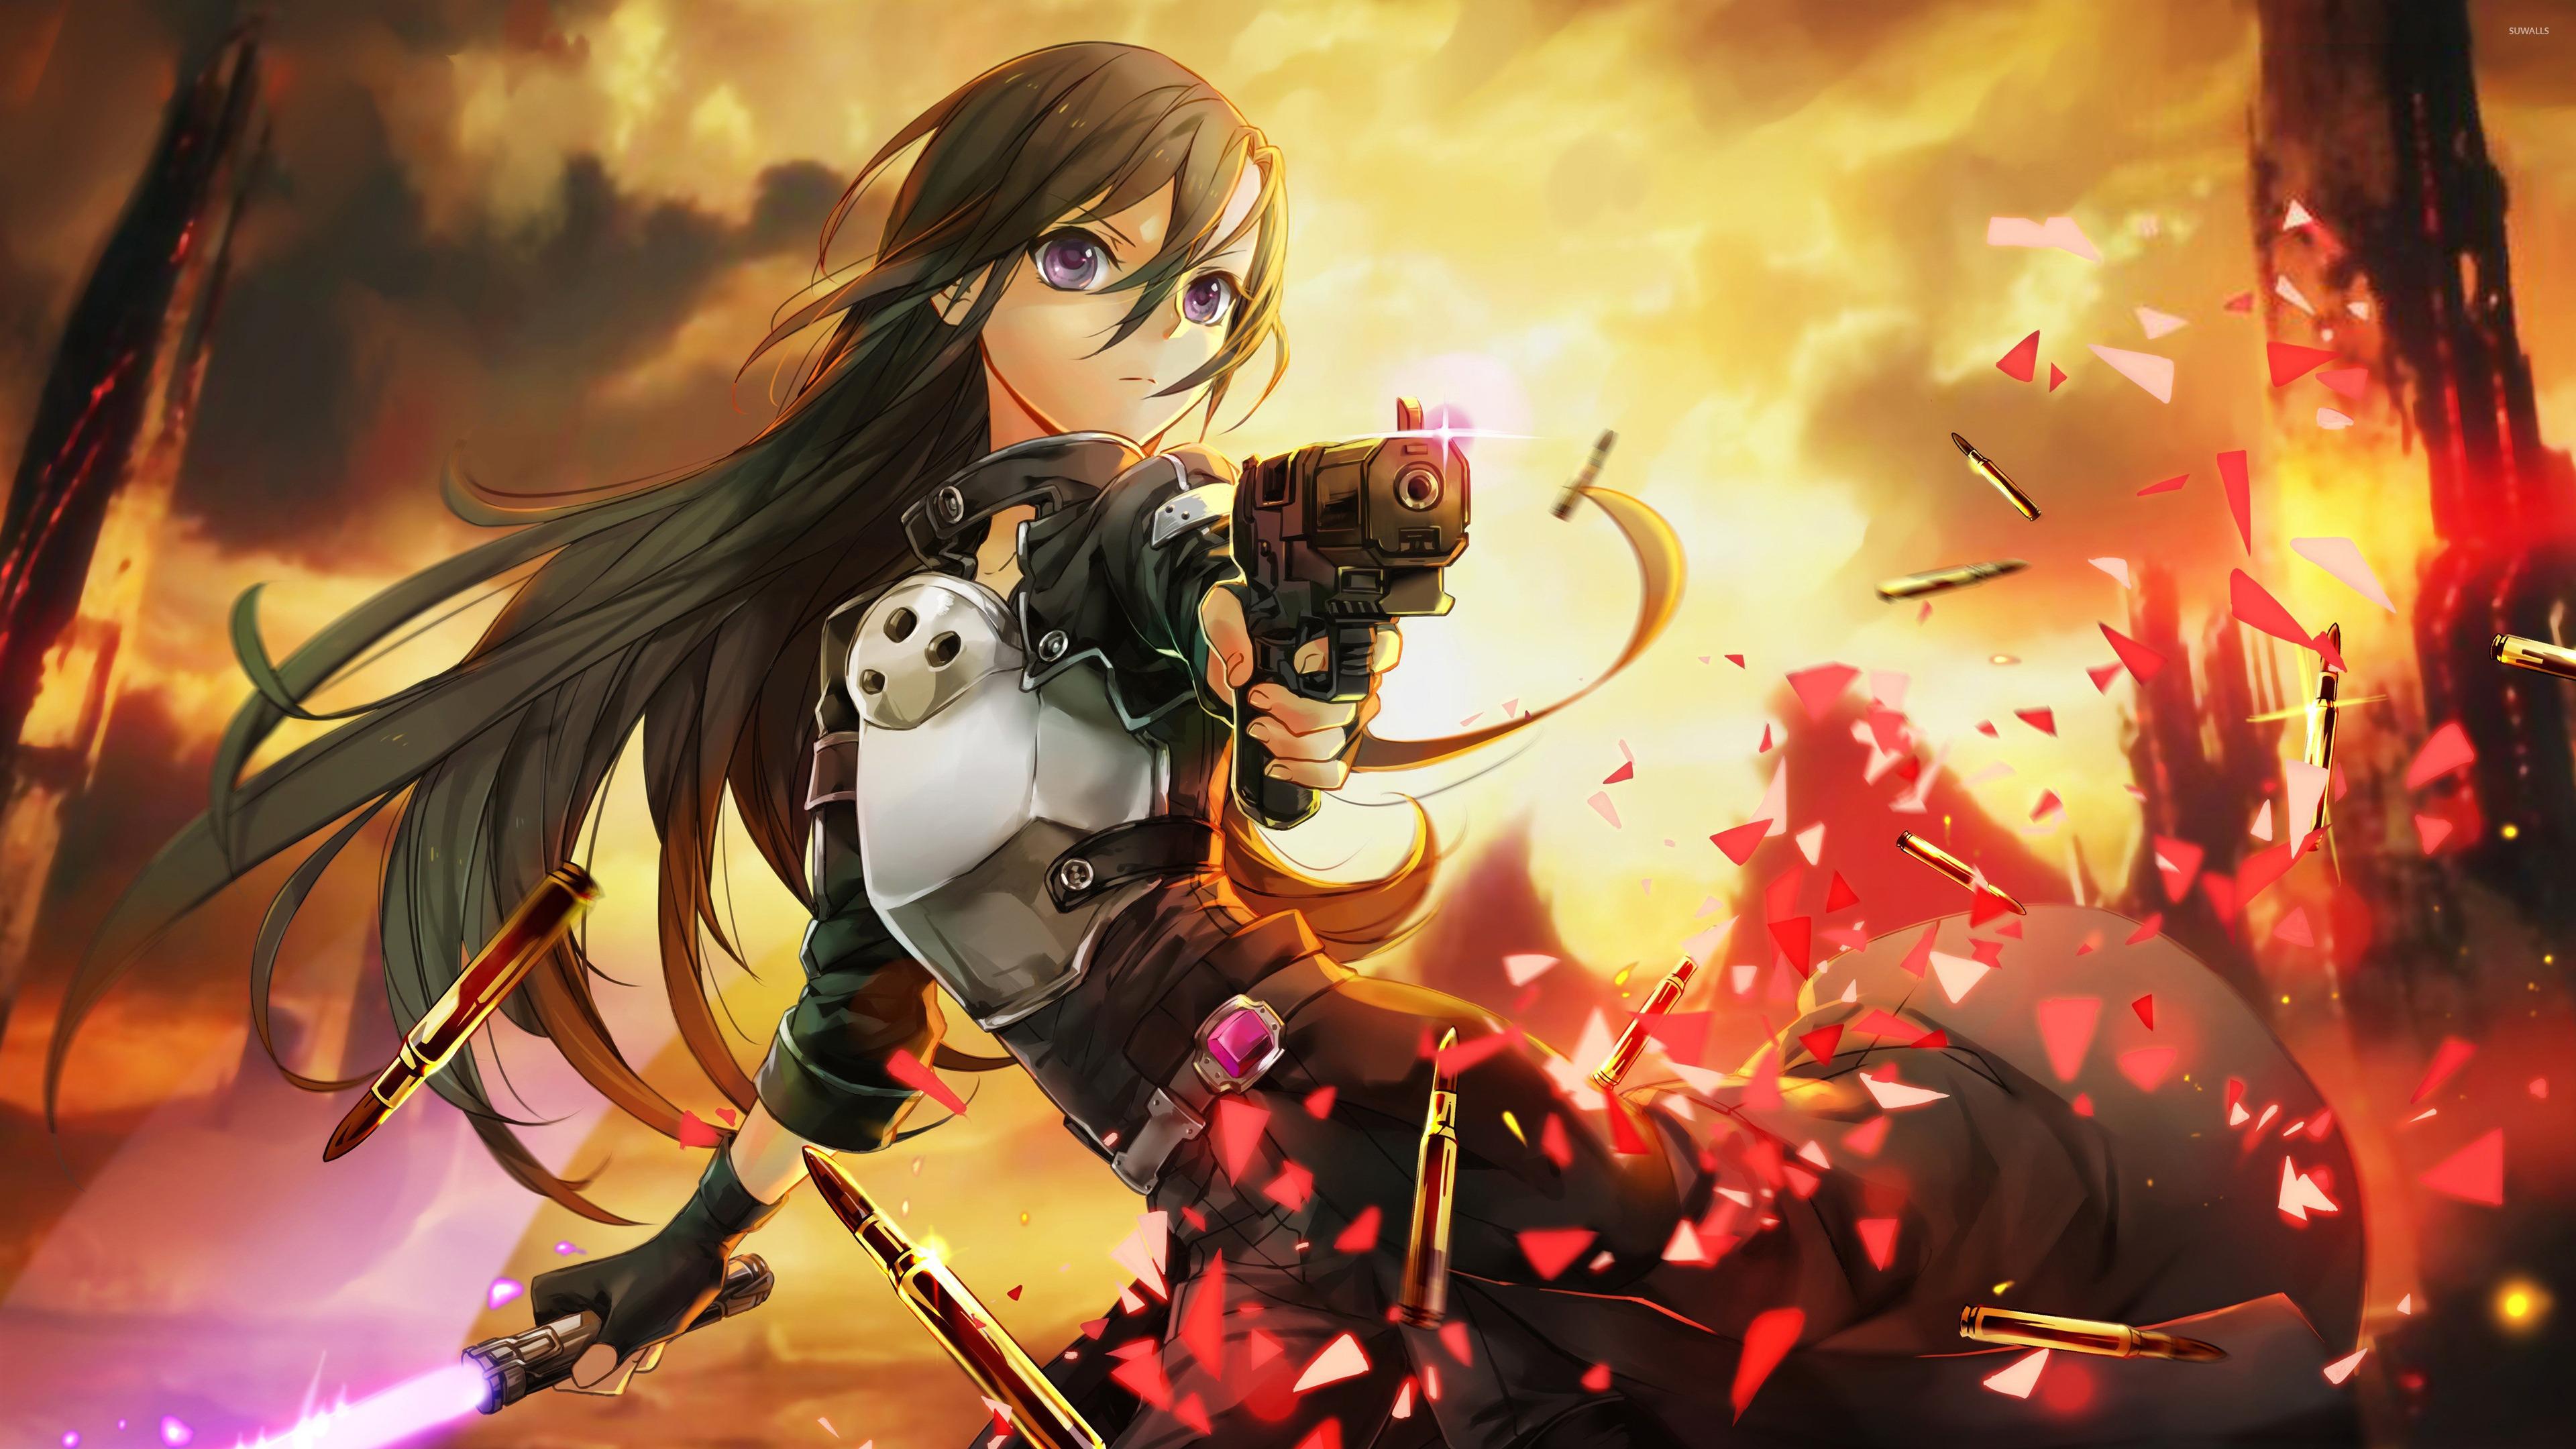 asuna - sword art online wallpaper - anime wallpapers - #45836